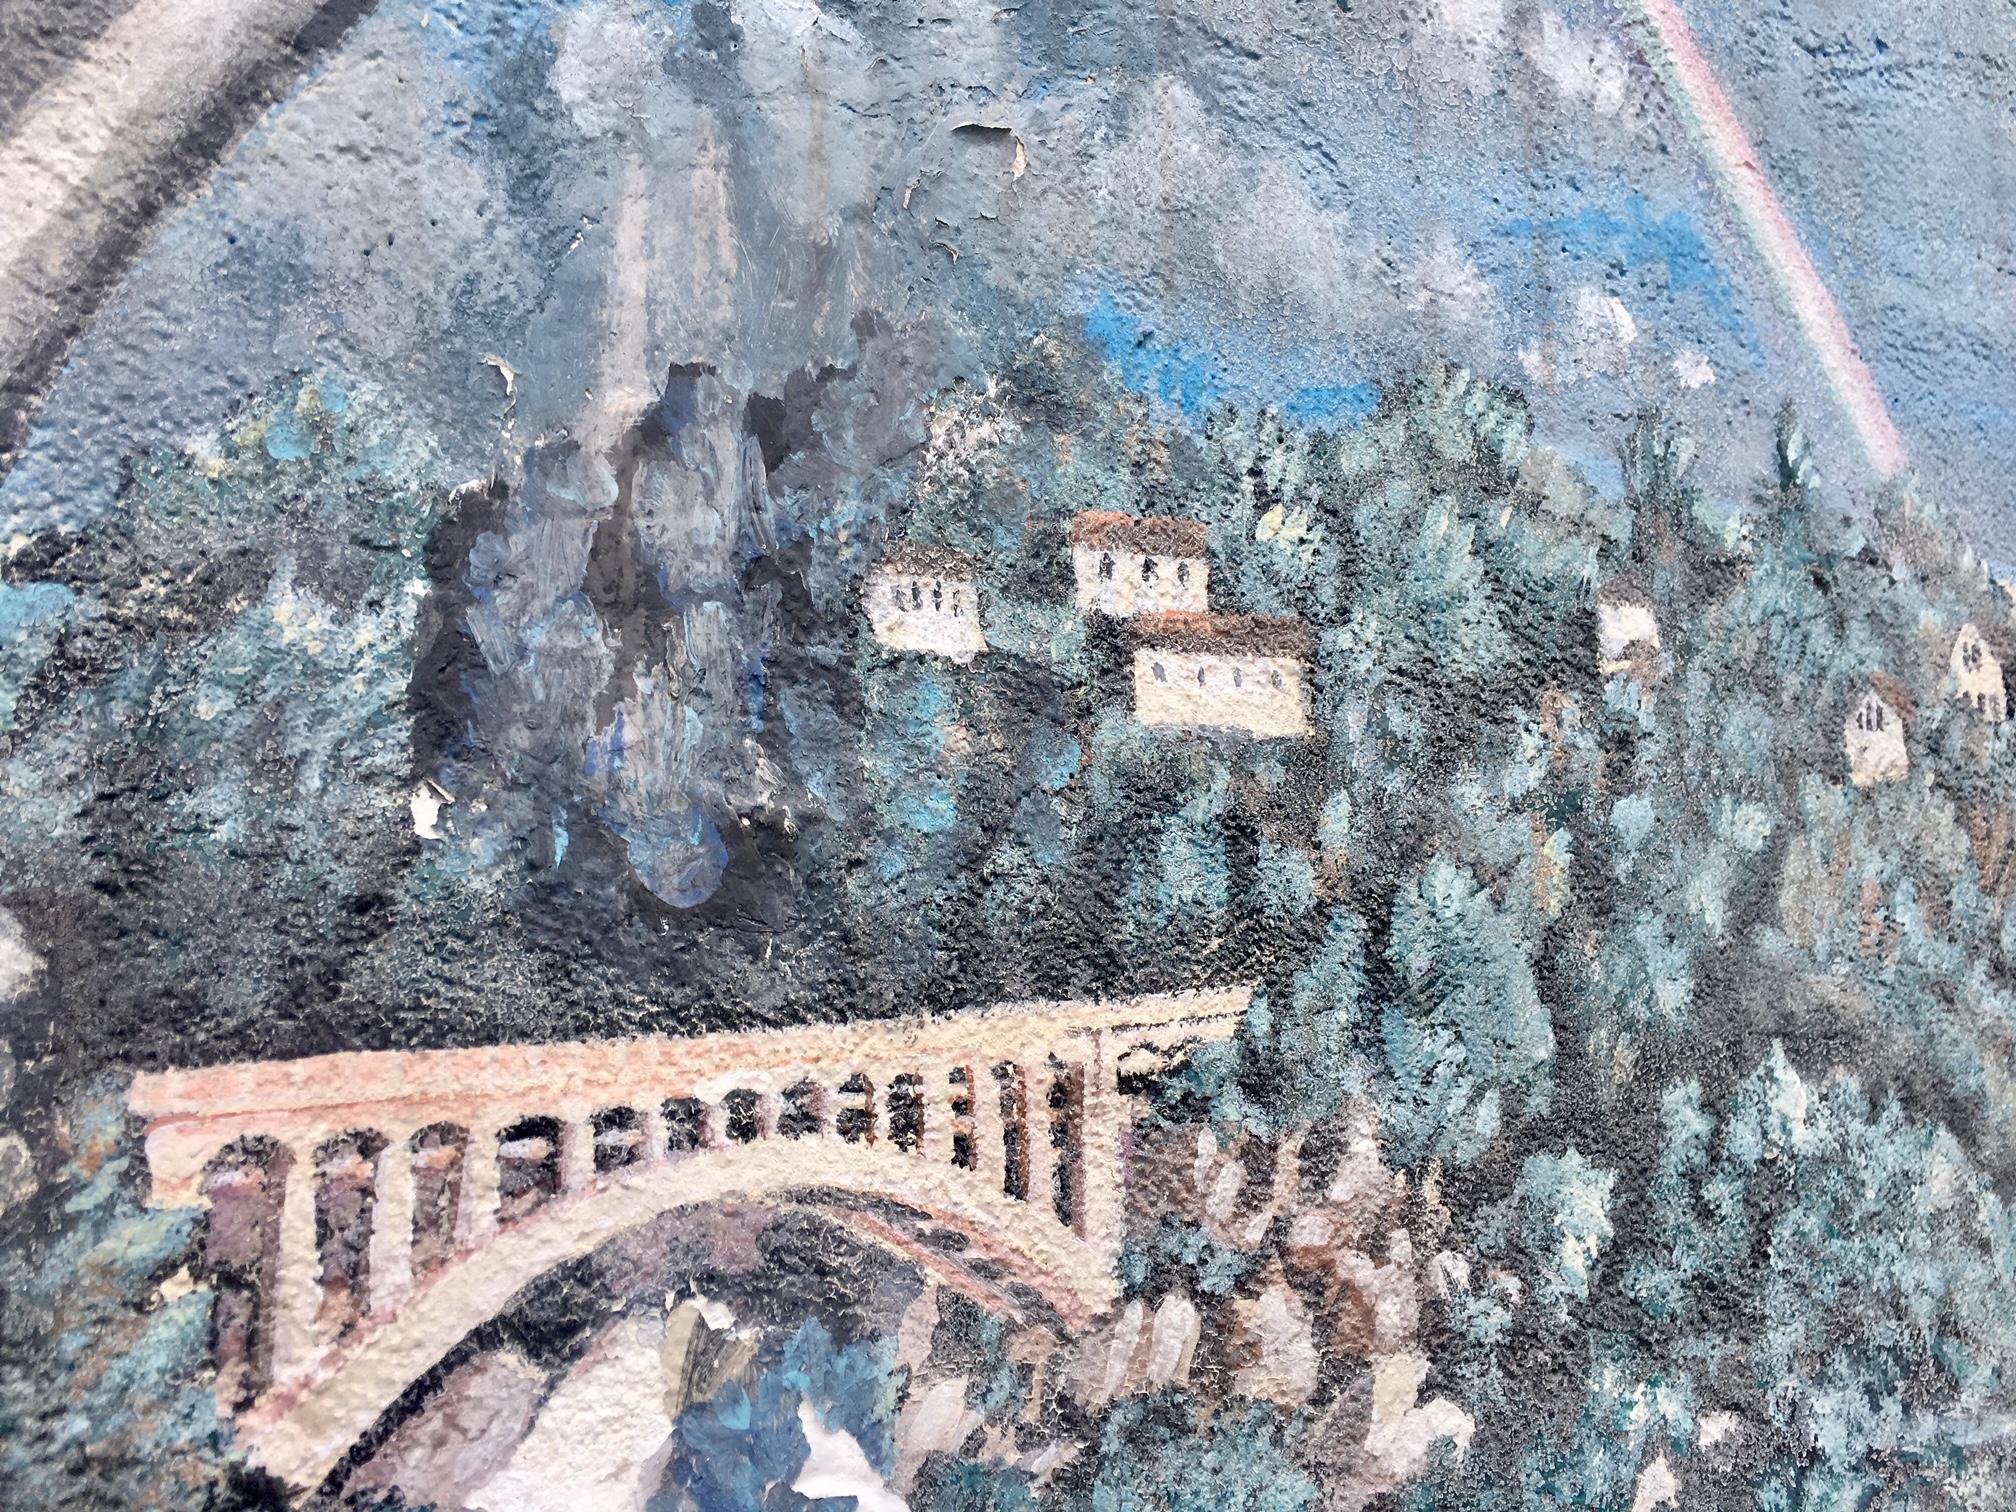 Historic Folsom # 3 - Rainbow Bridge in Mural